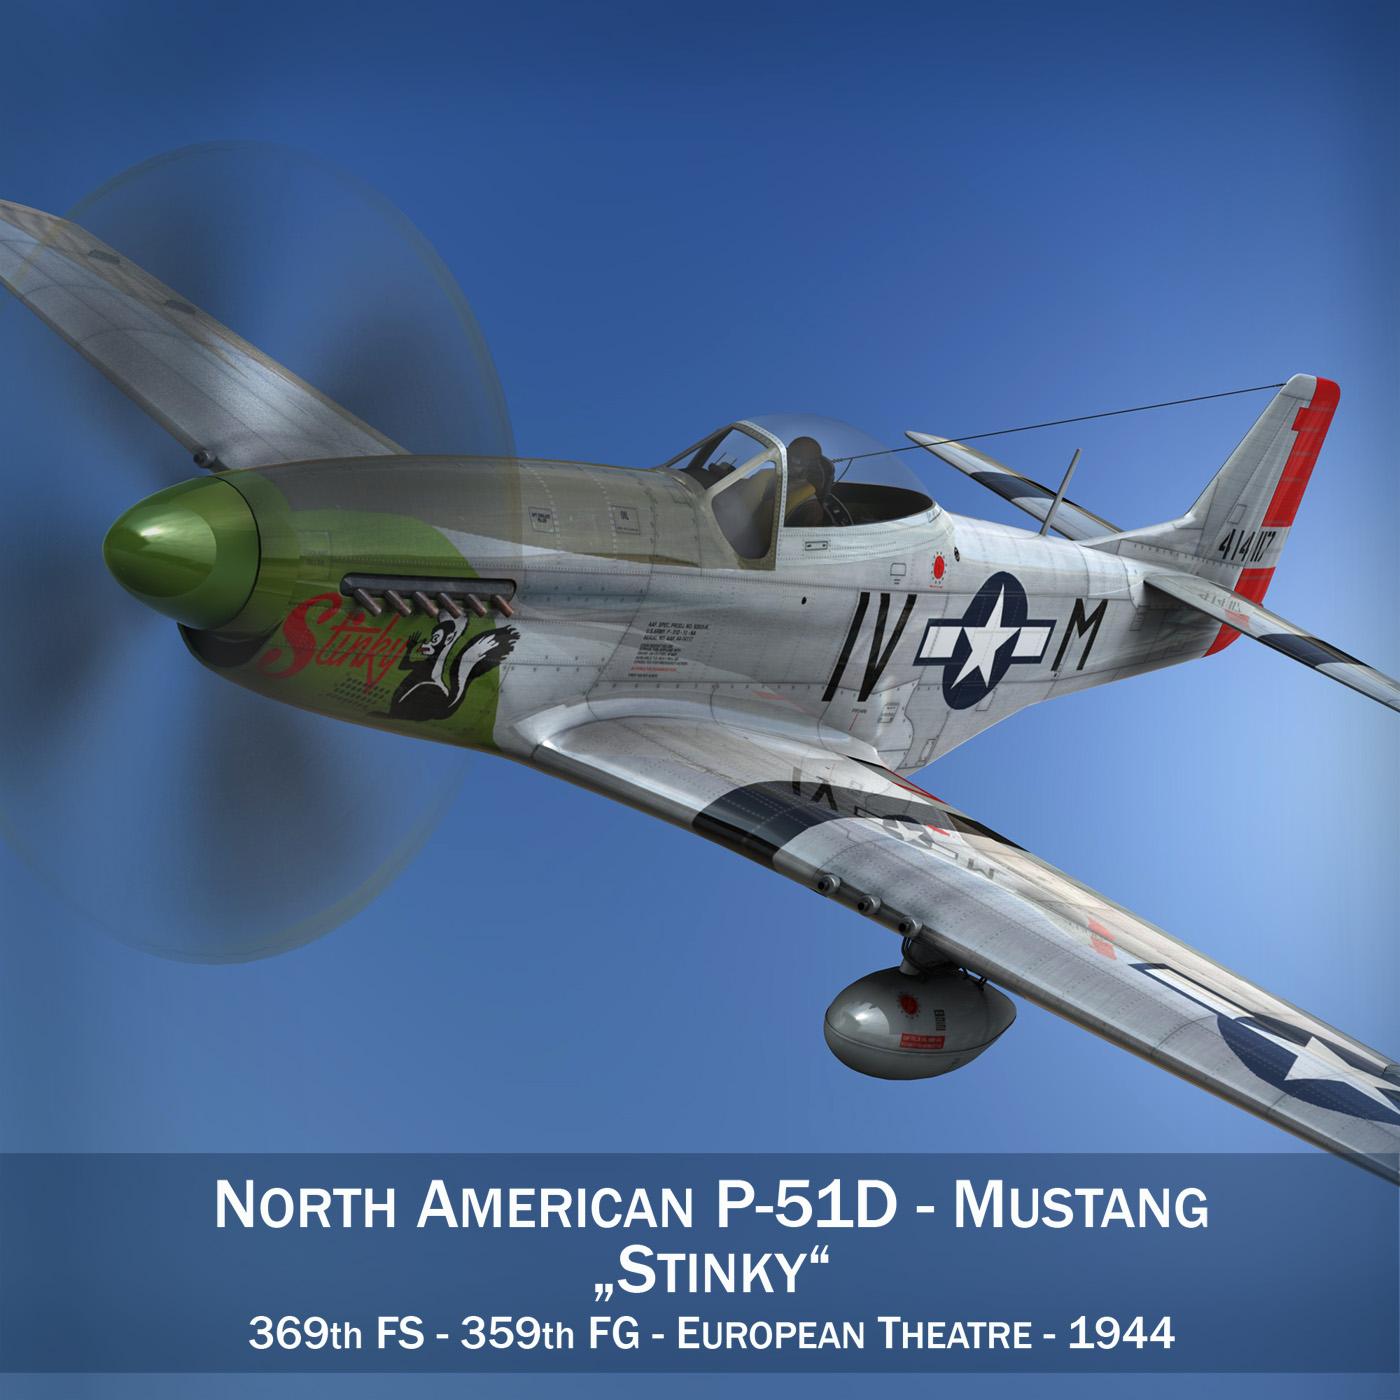 north american p-51d mustang – stinky 3d model fbx c4d lwo obj 269595